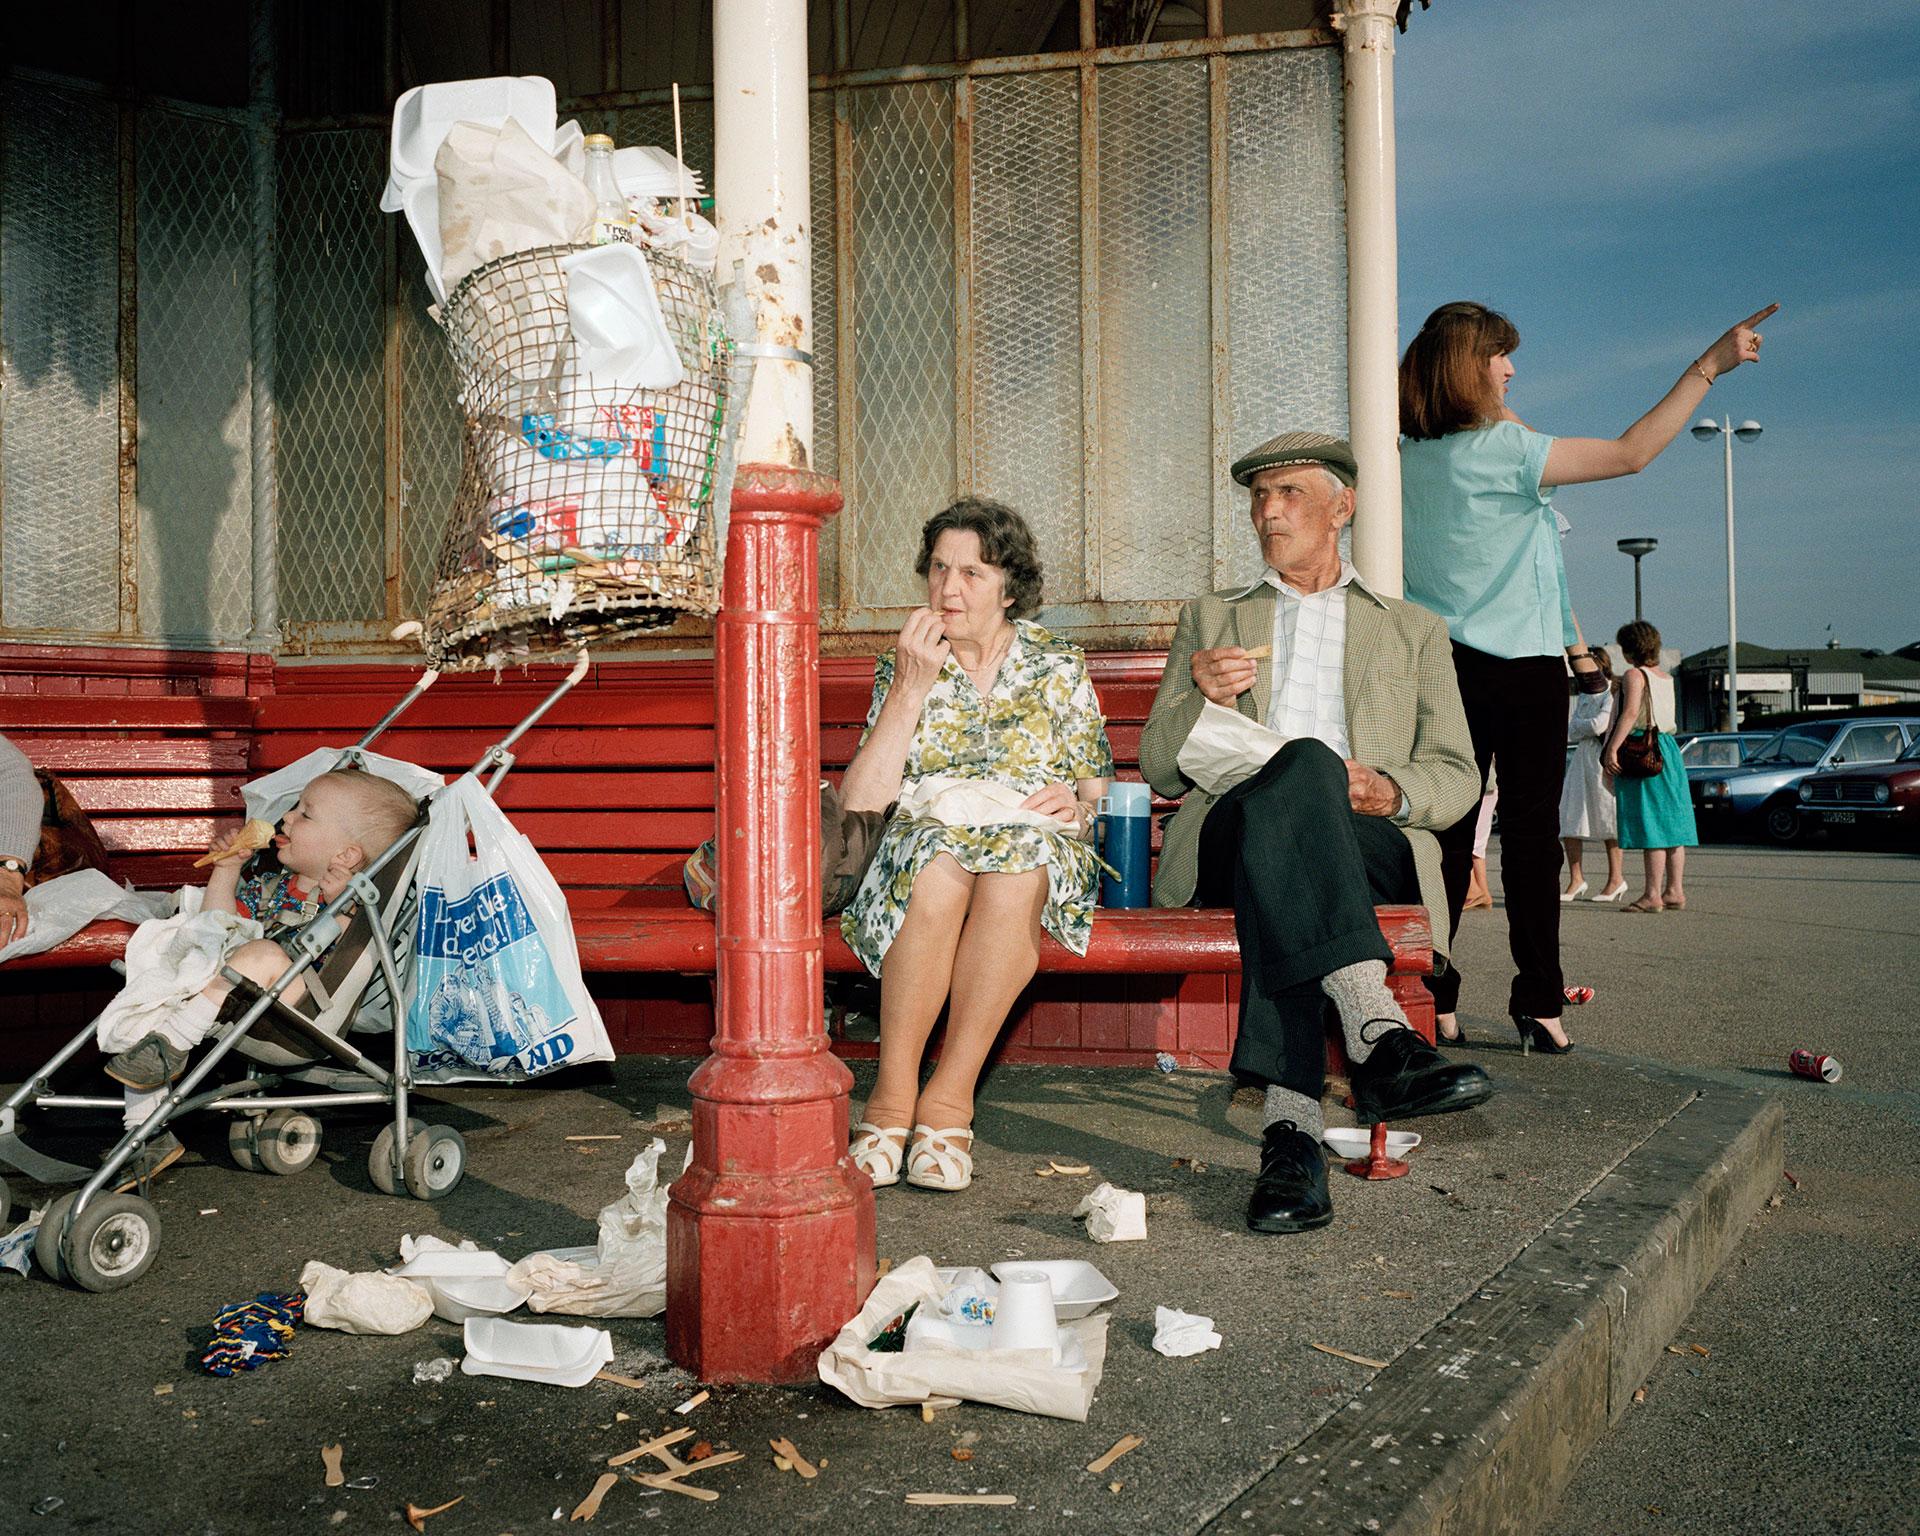 The Last Resort, New Brighton. Martin Parr.